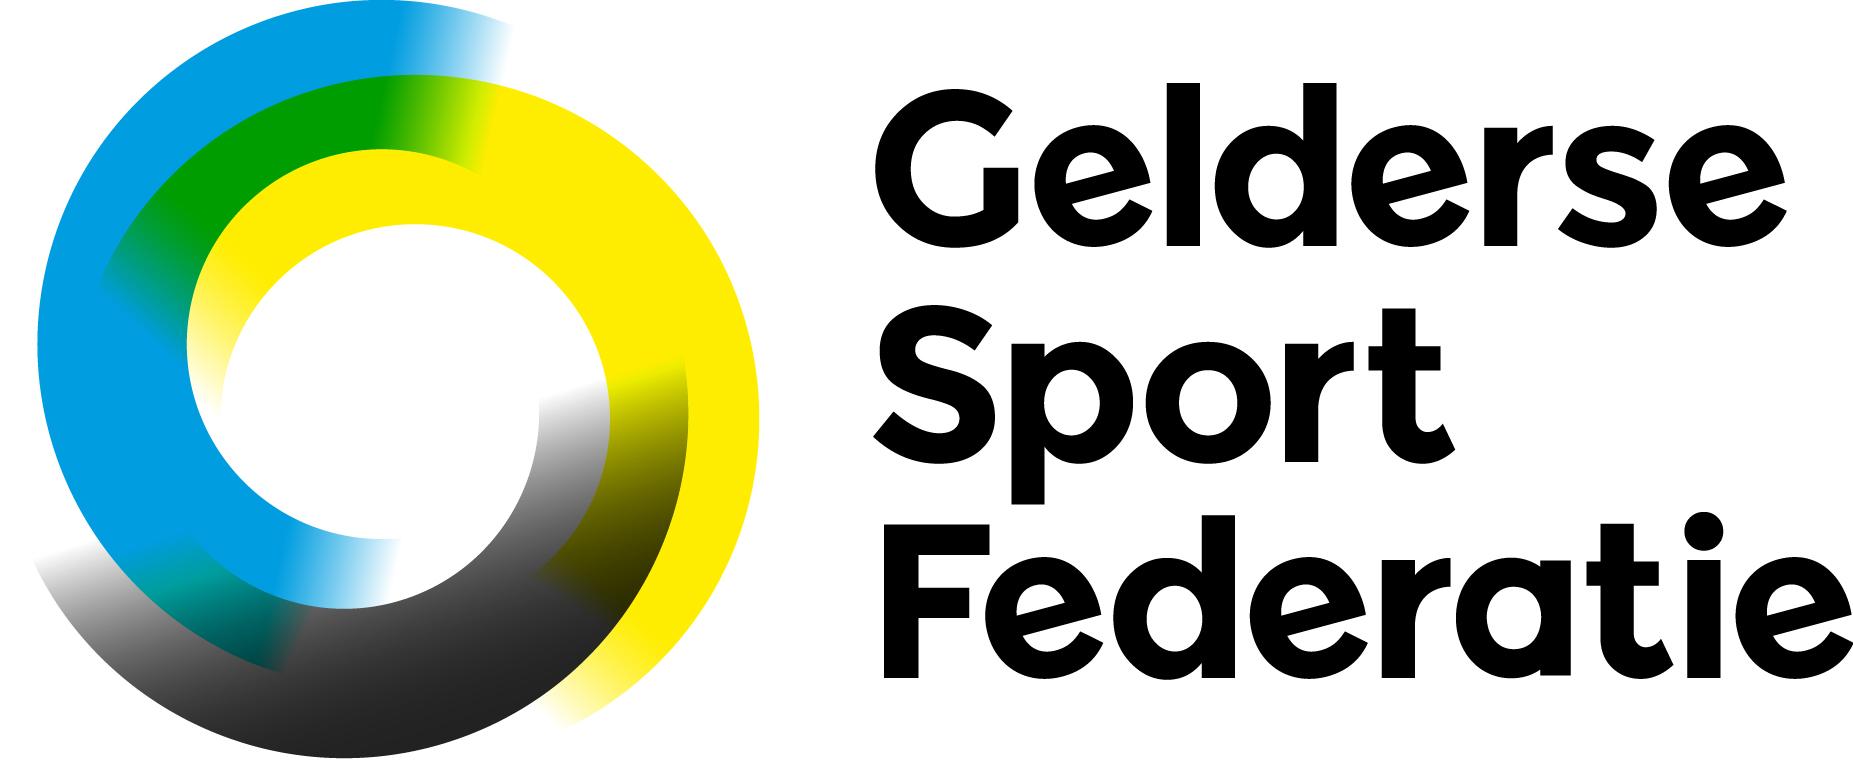 Gelderse Sport Federatie